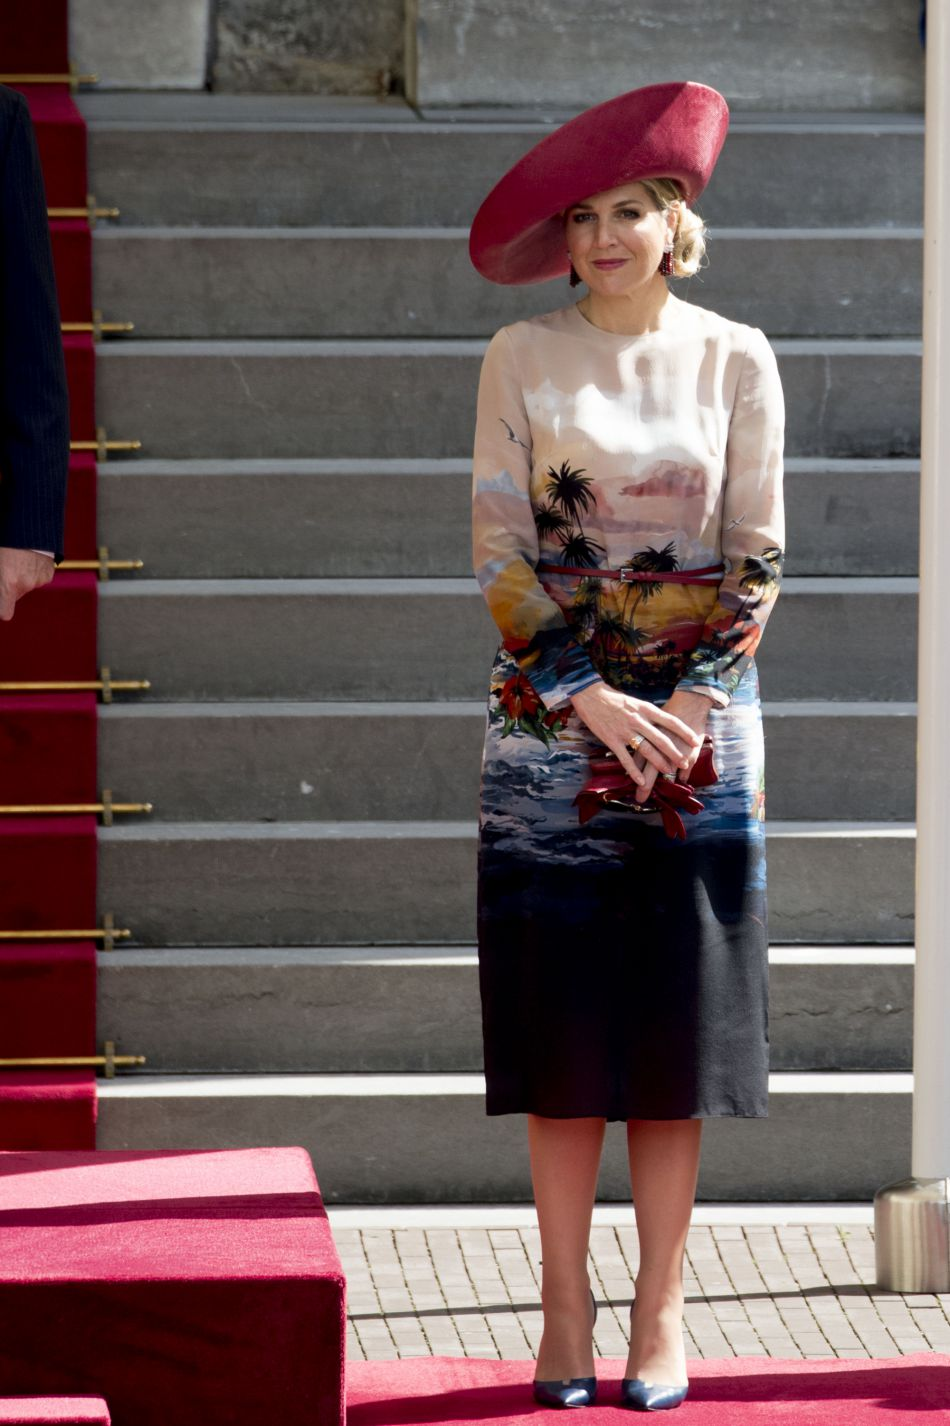 Maxima des Pays-Bas ose la robe hawaienne.